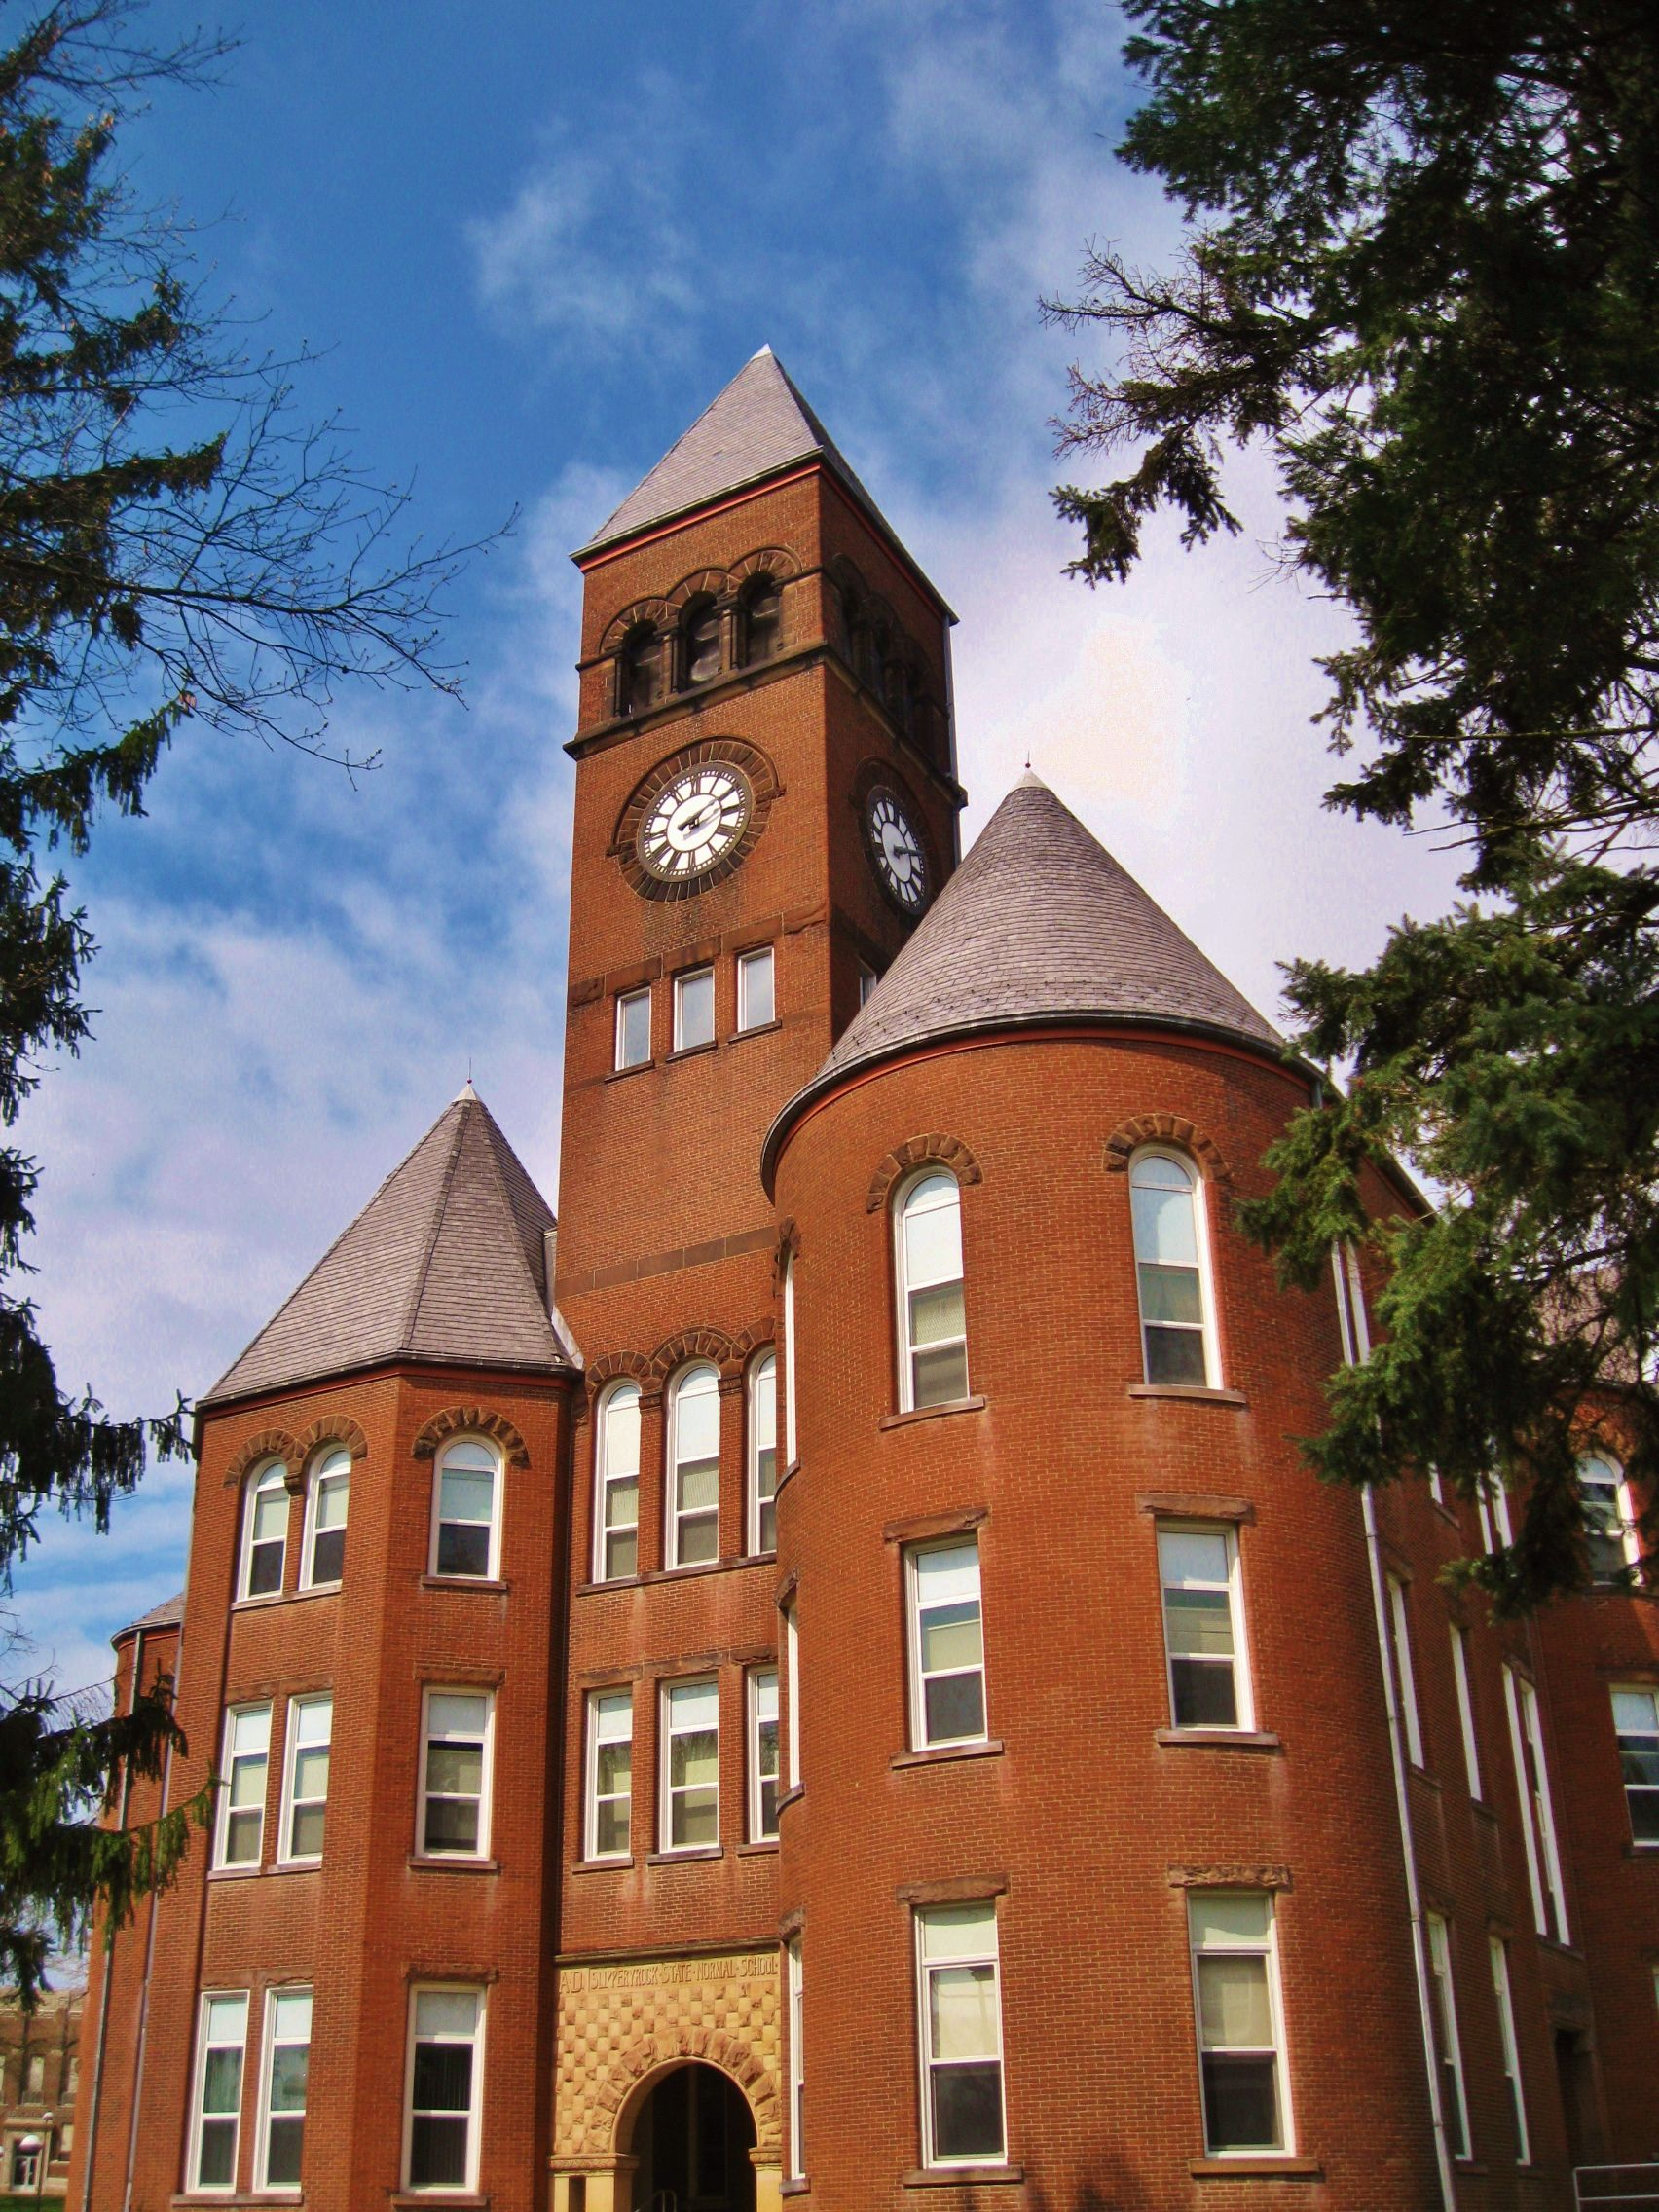 Old Main Slippery Rock University Pa Where My Grandparents